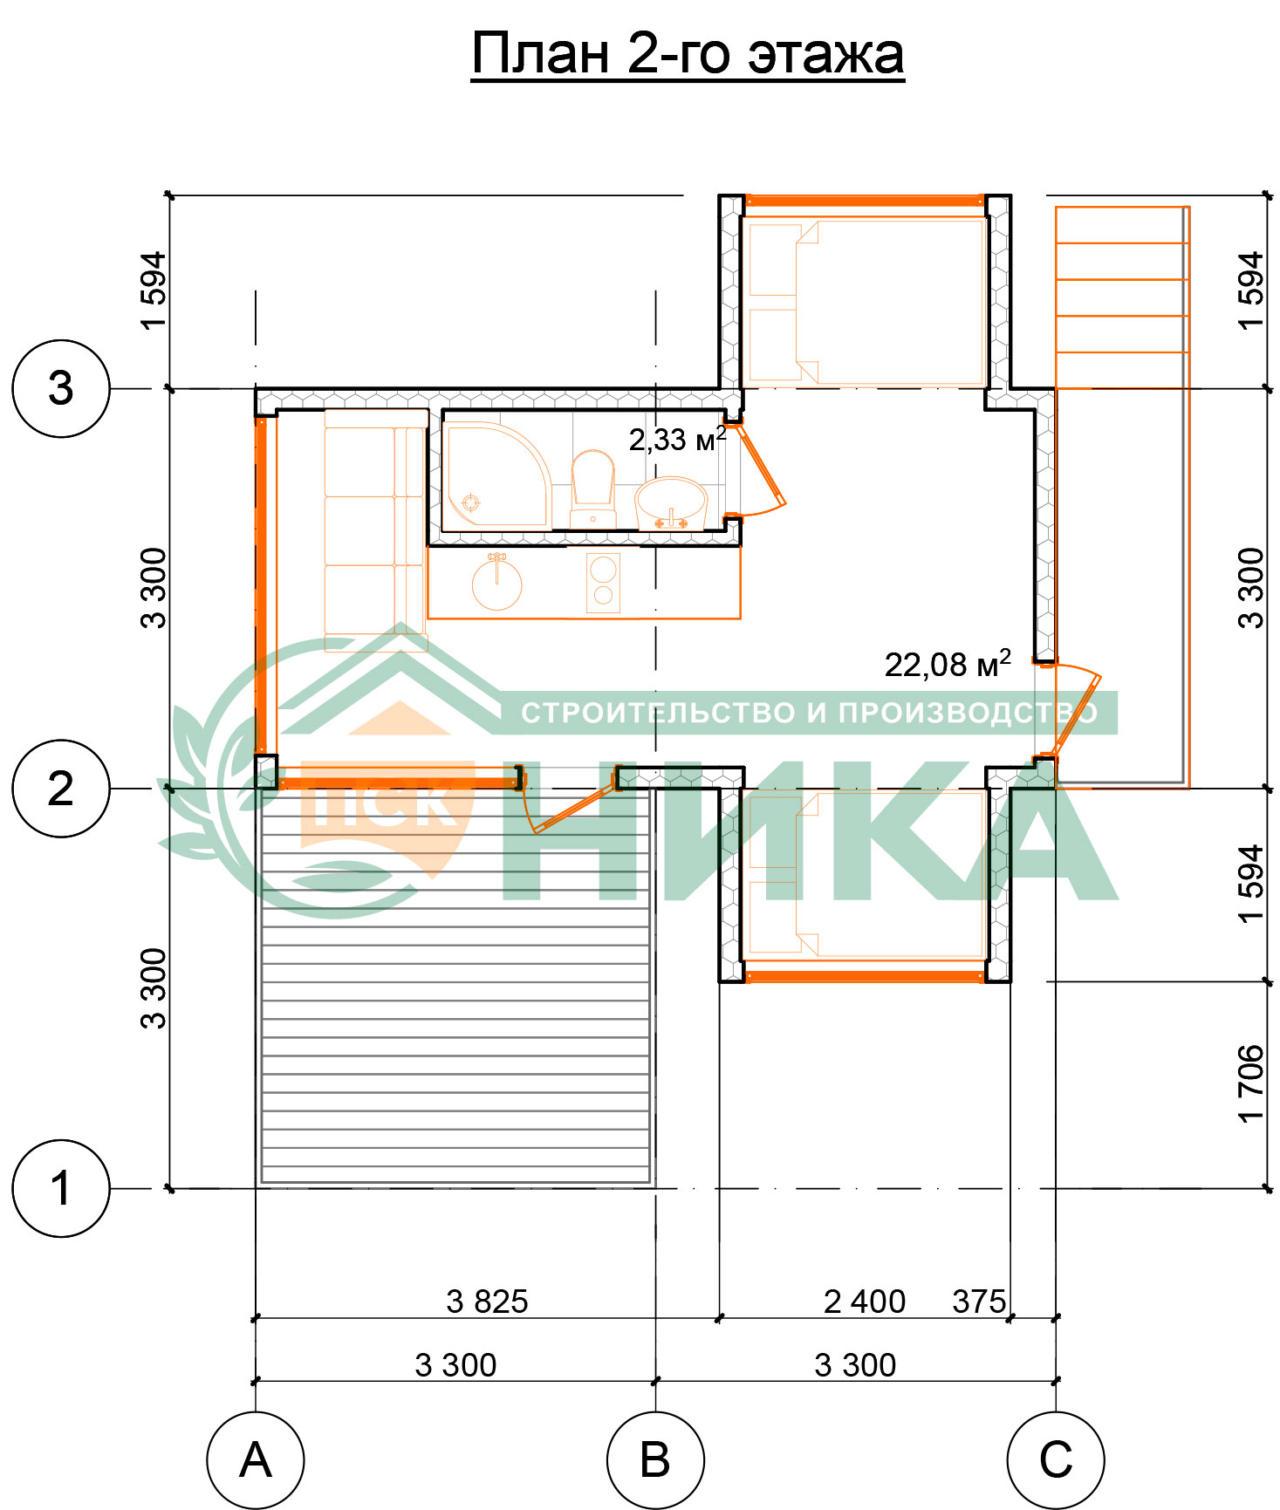 План второго этажа проекта Панорамы Коктебеля